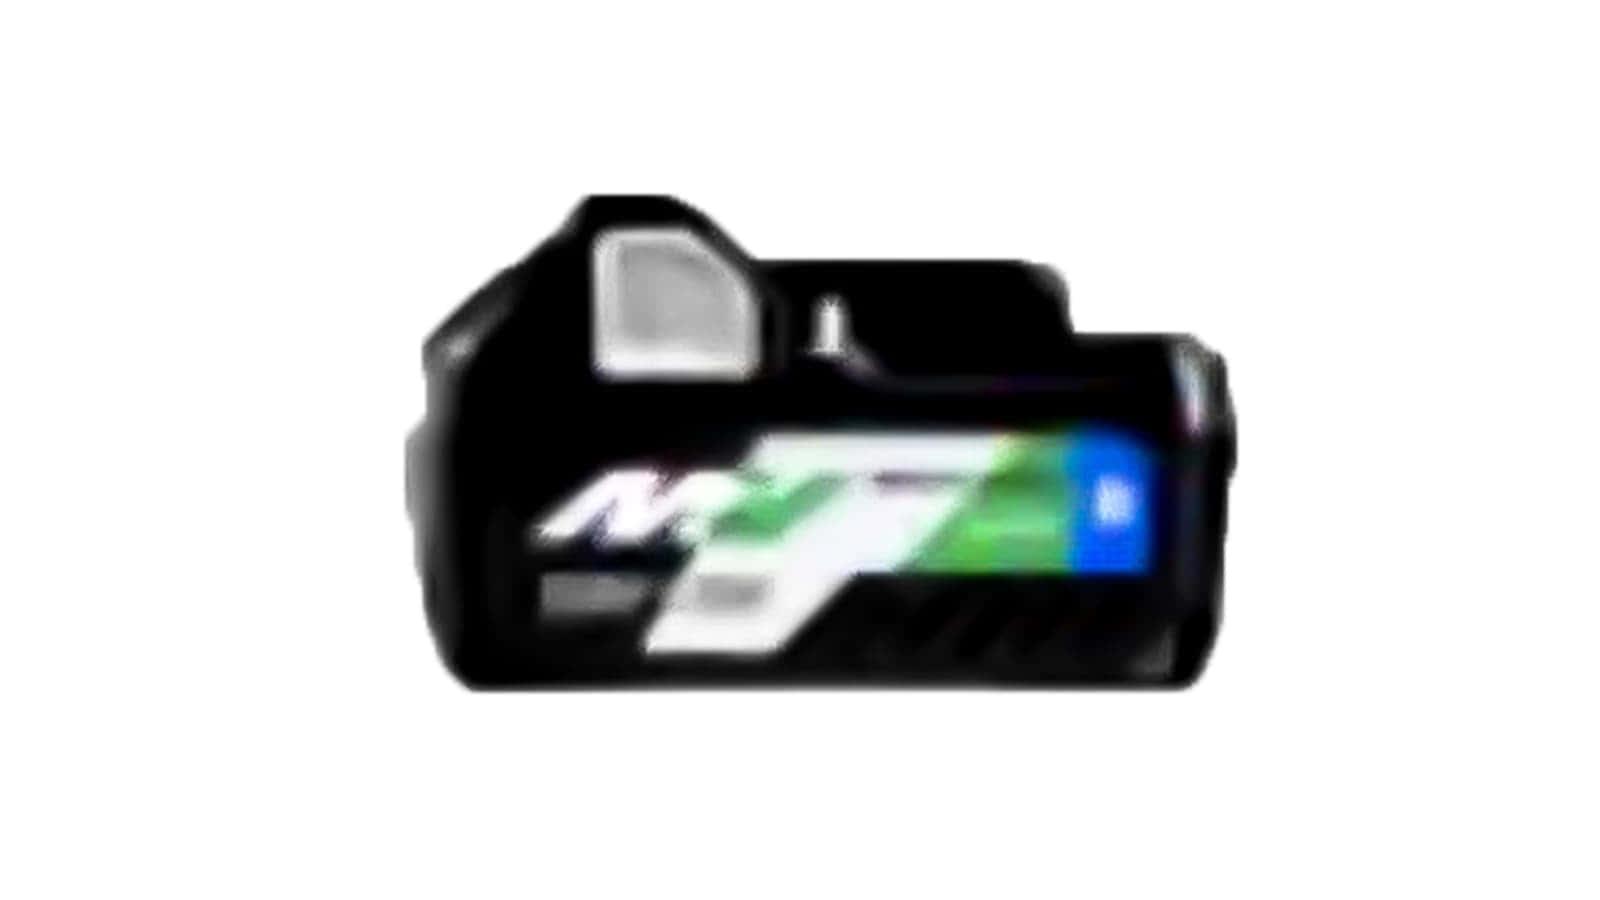 HiKOKI、Bluetooth搭載バッテリー「BSL36A18B」を発表。バッテリー単体で集じん機連動を実現